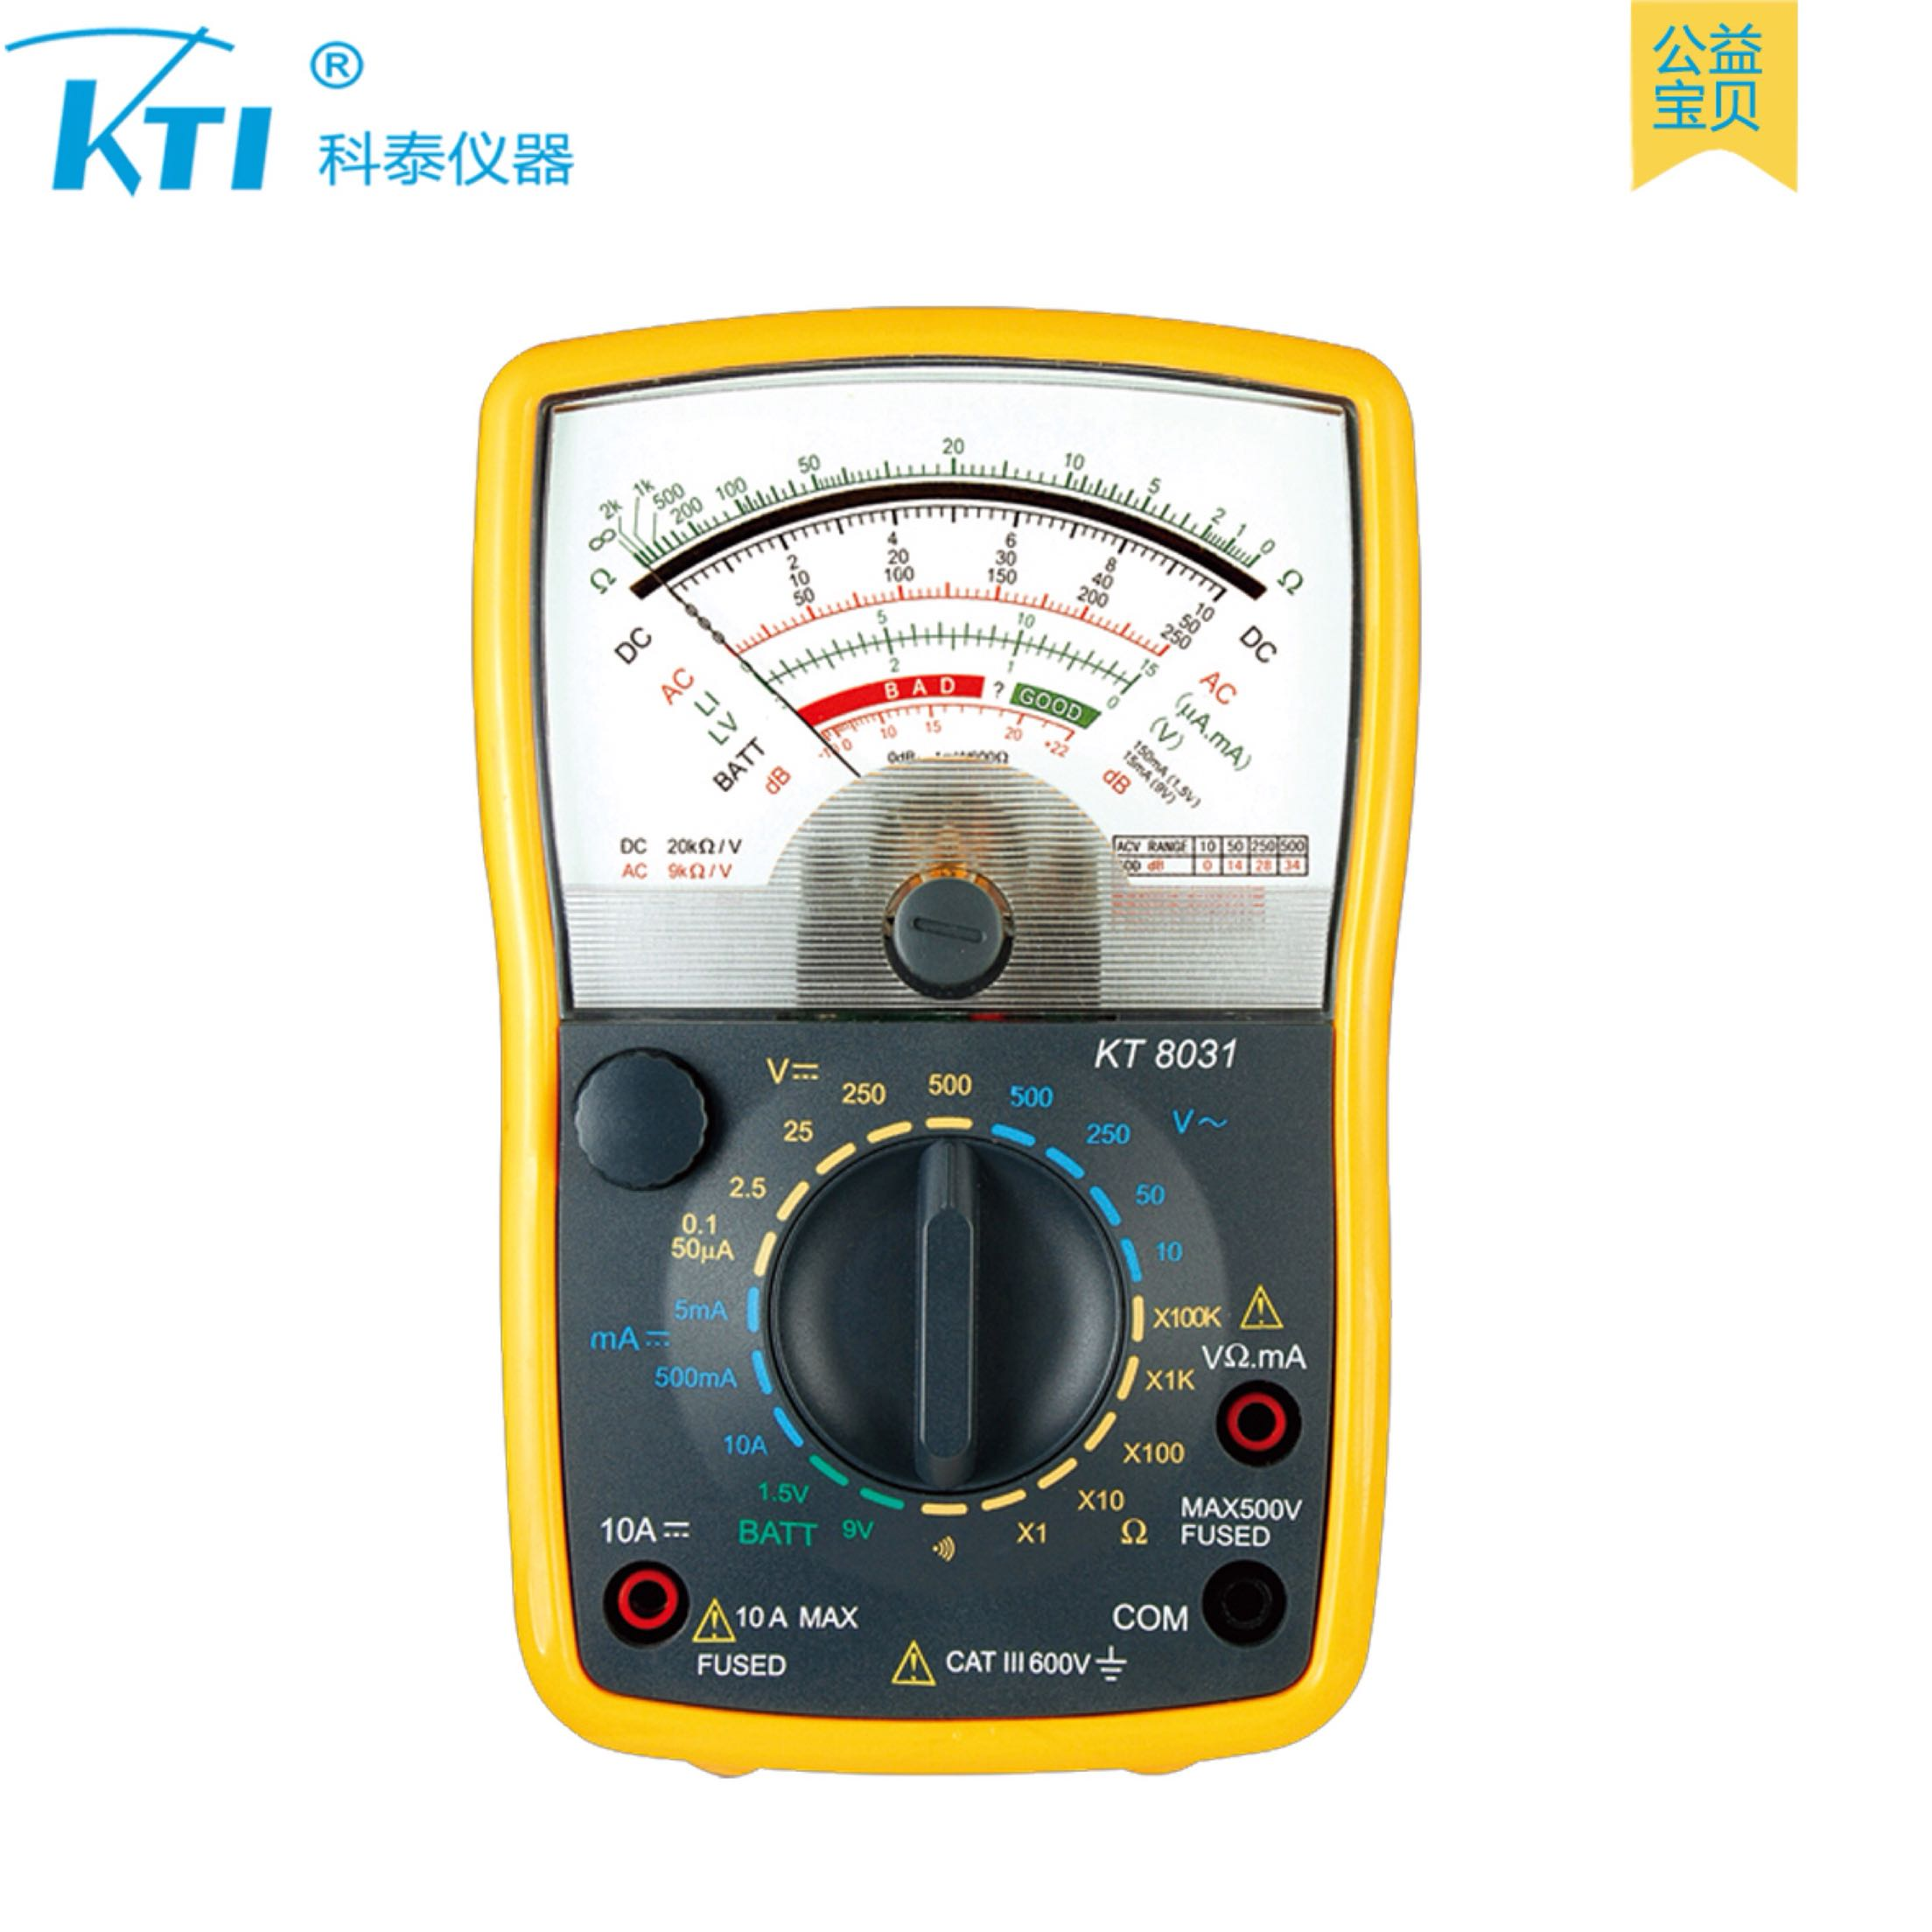 Elcoteq Genuine Original Analog Multimeter High sensitivity Handheld analog Multimeter KT8031